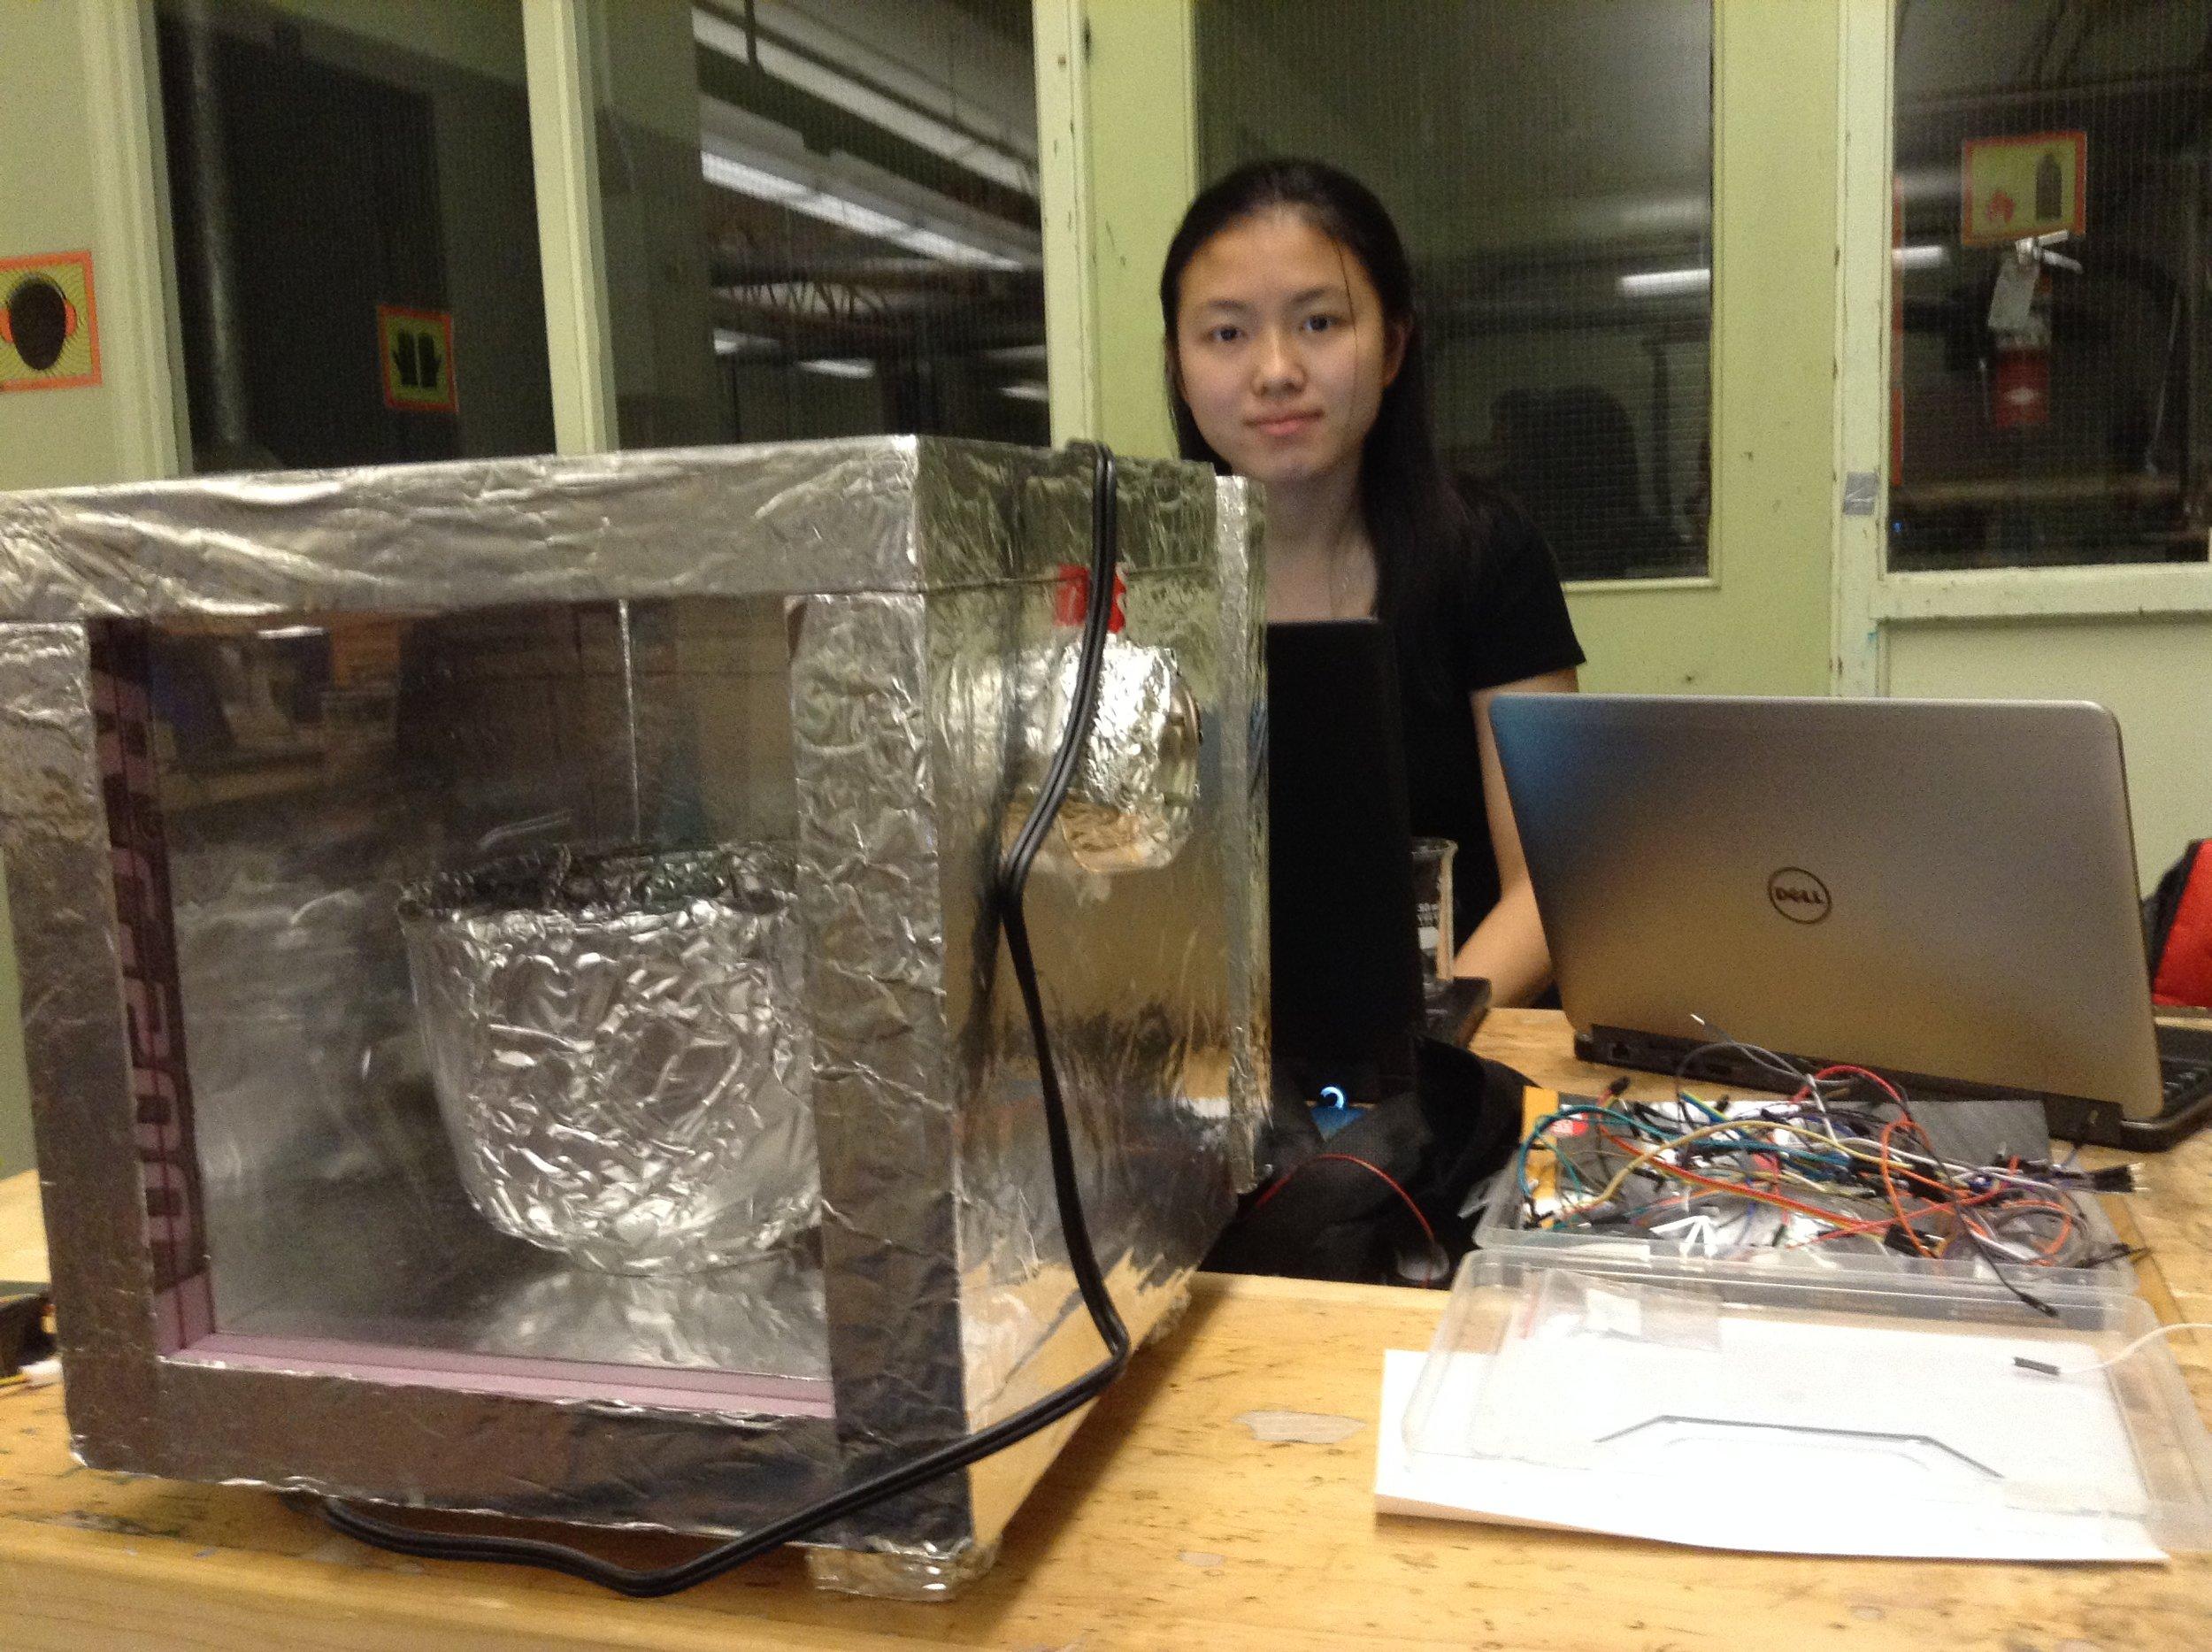 Crystal Growing Incubators